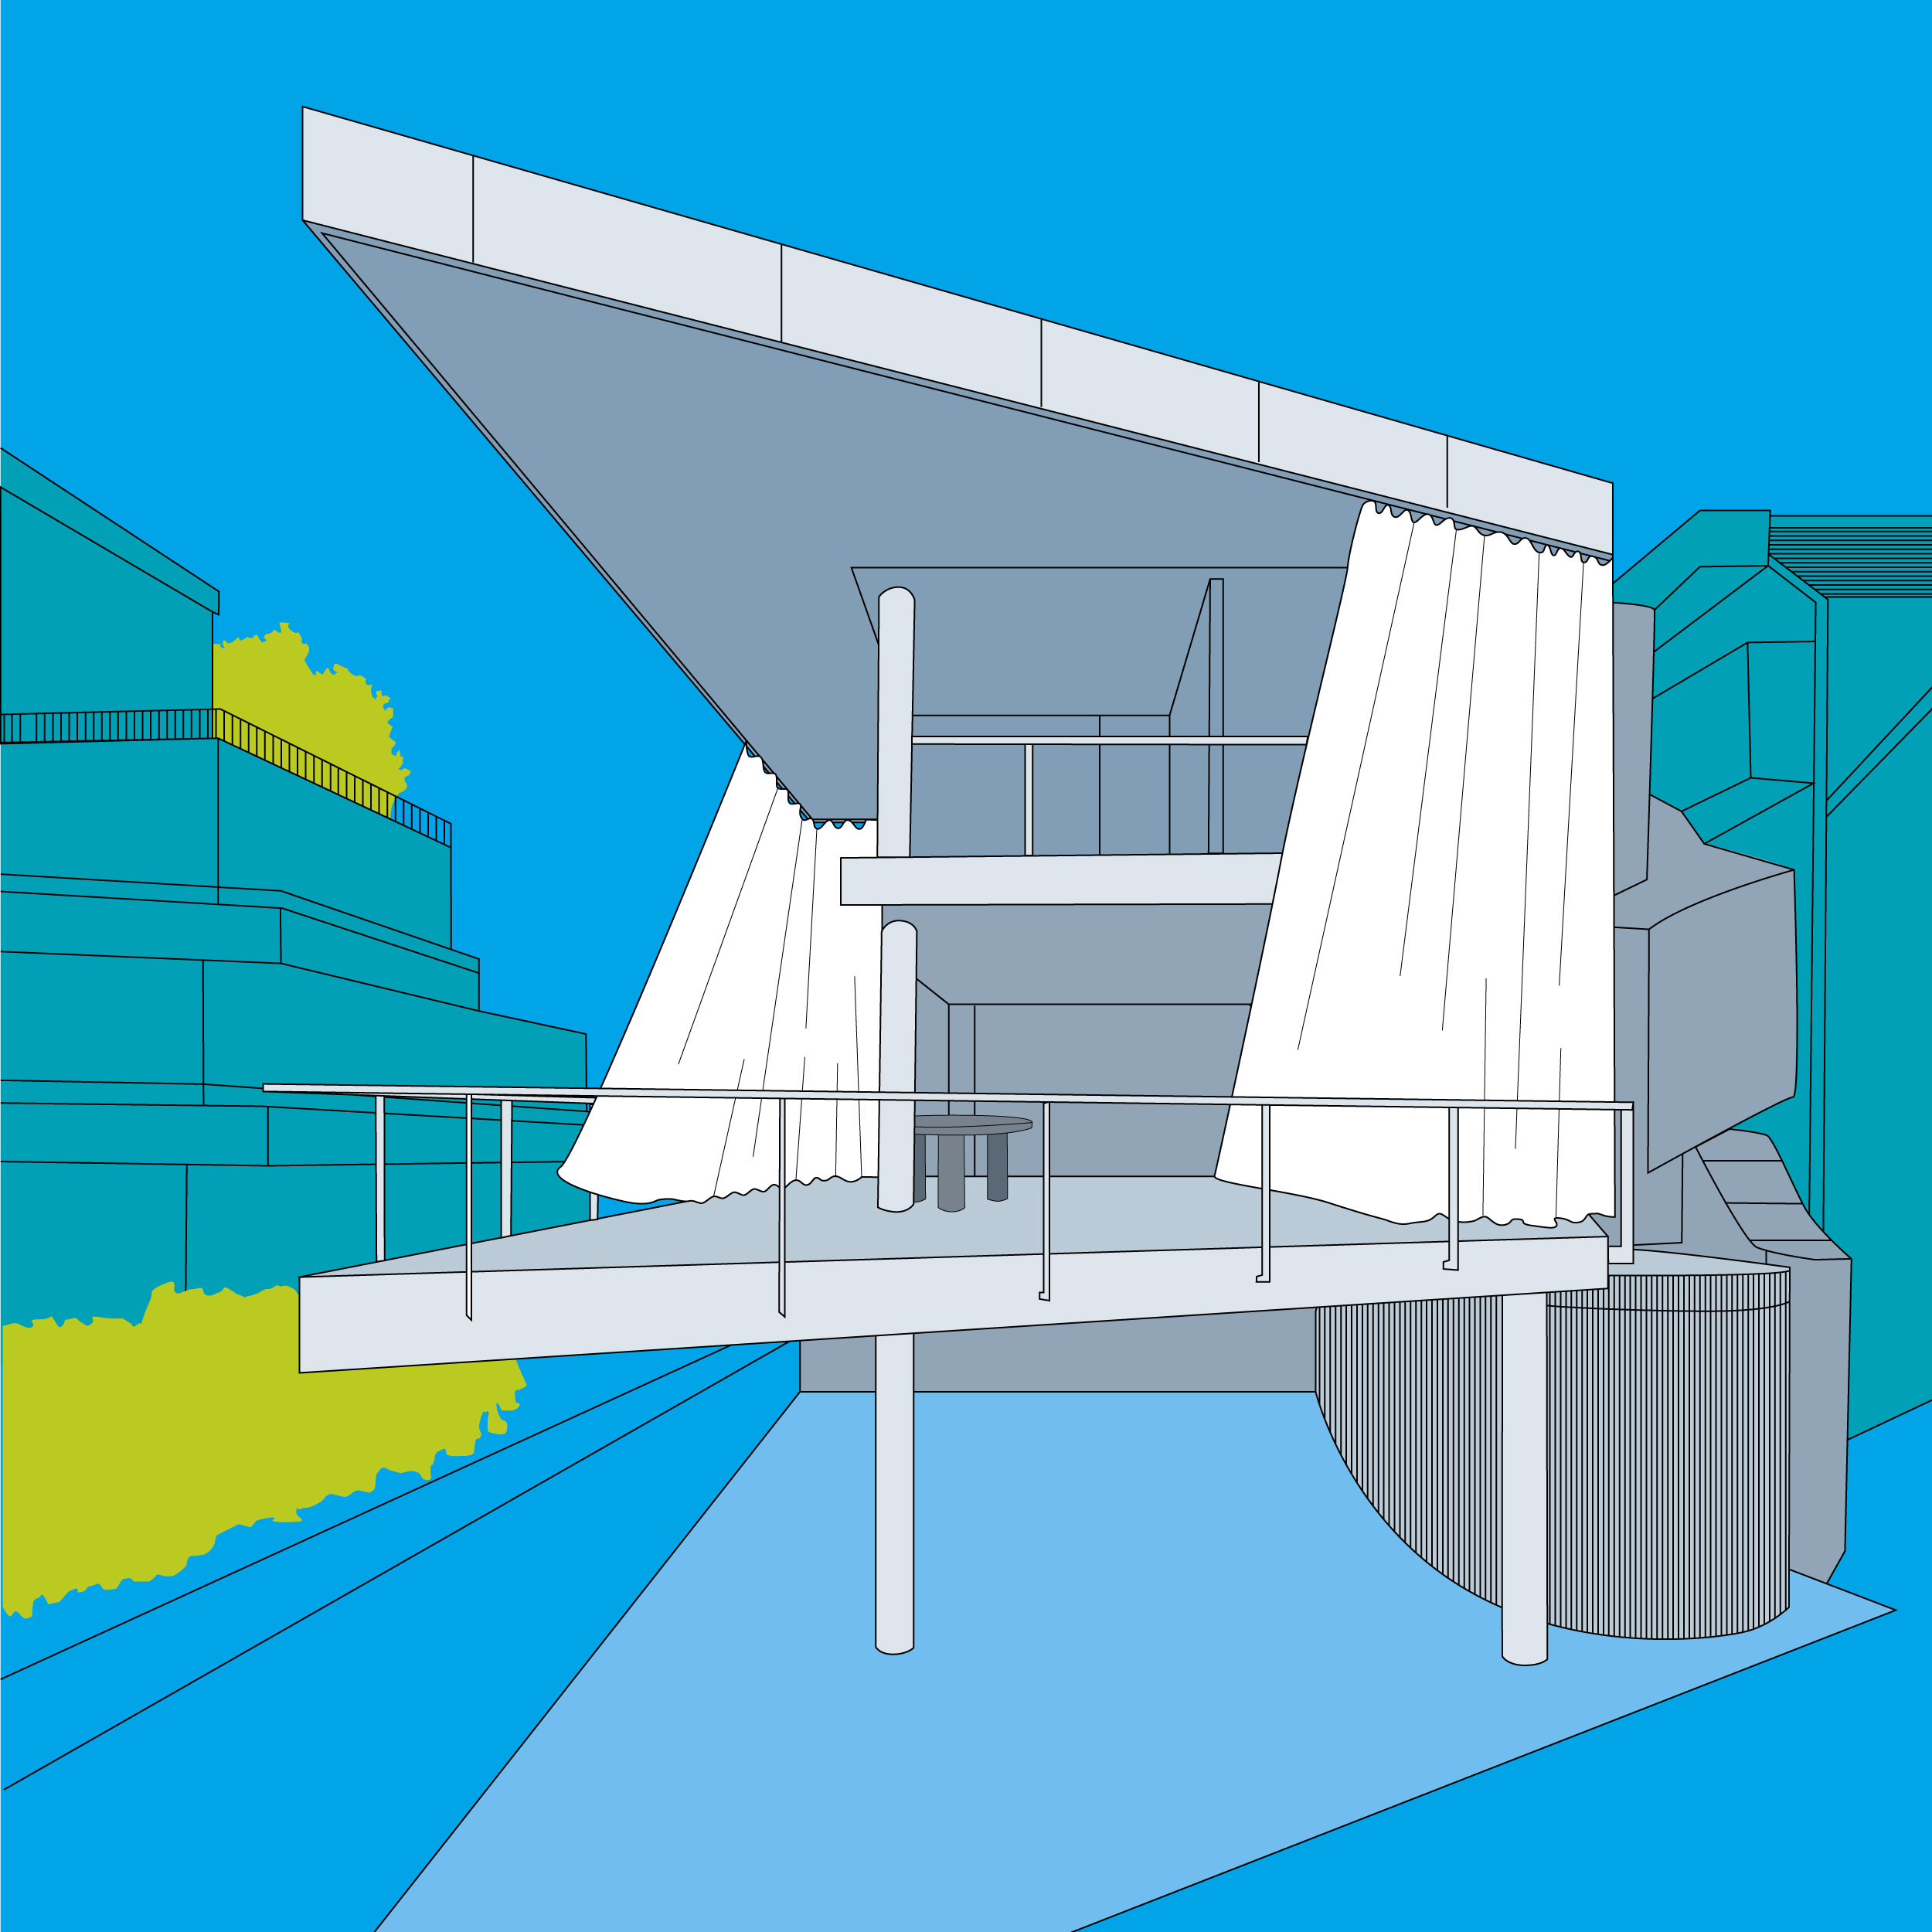 Vector drawing made in Adobe Illustrator.